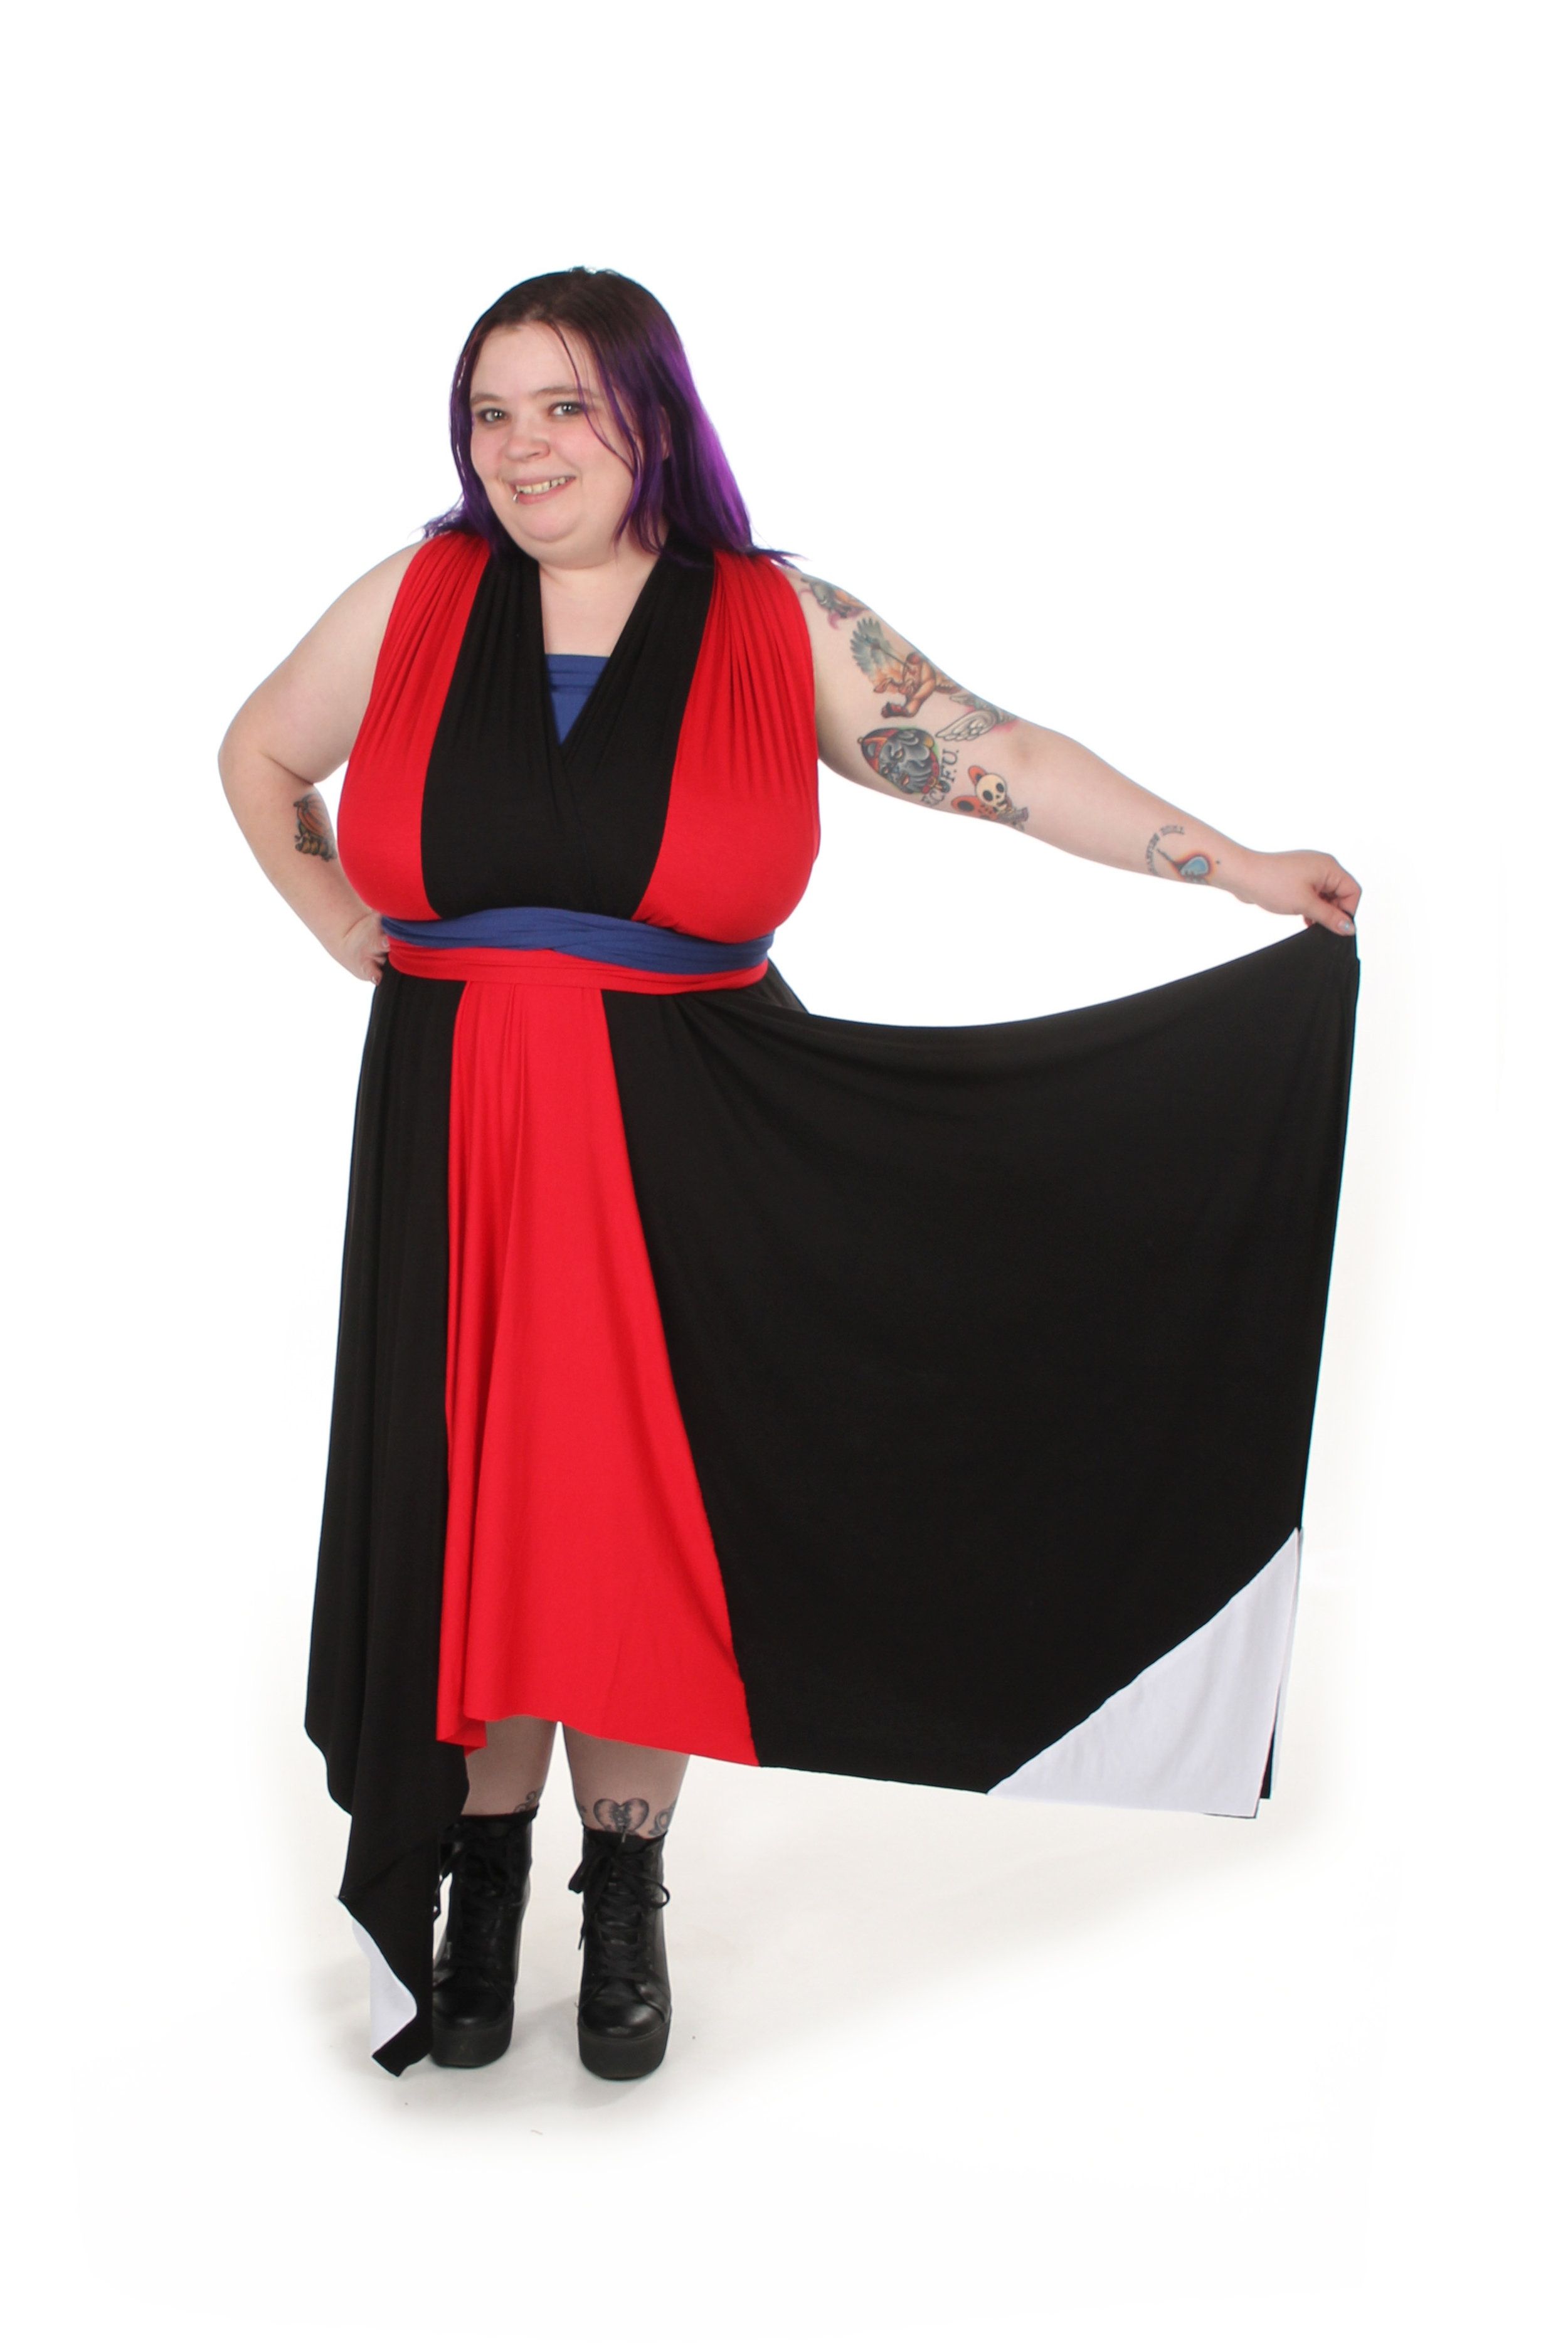 Teleporting Mutant Inspired Convertible Dress